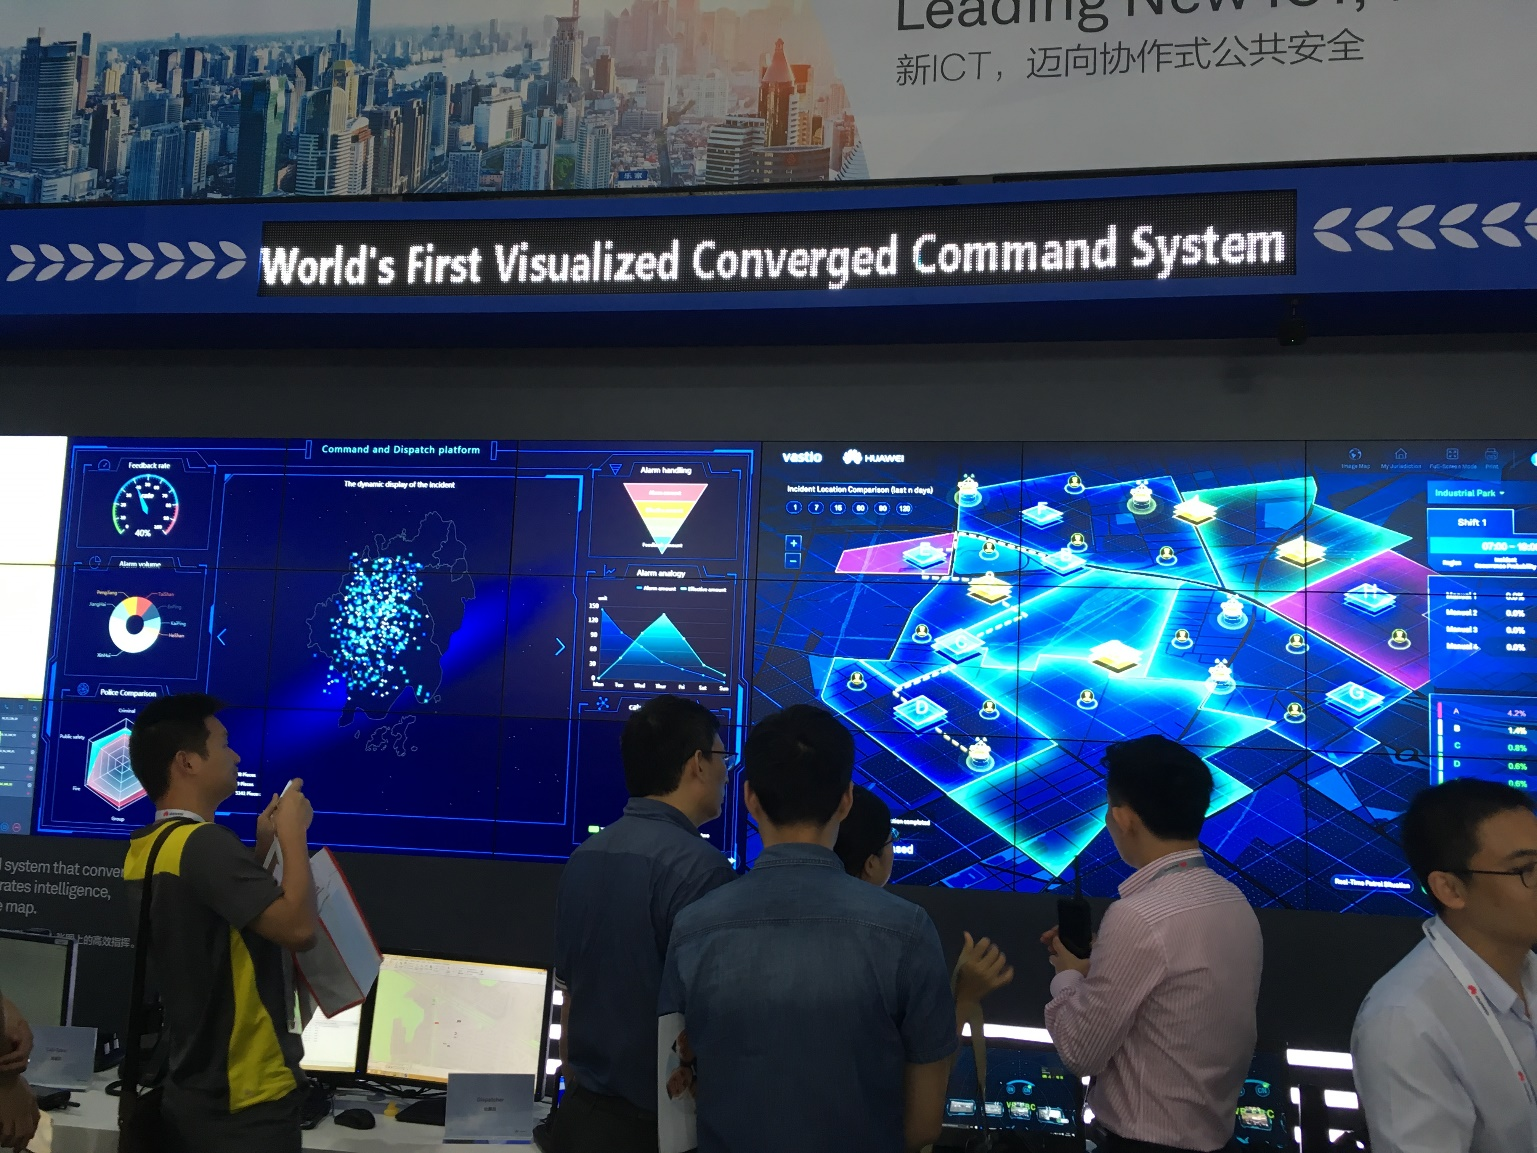 Китай — цифровая держава. Впечатления от Huawei Connect 2017 - 6